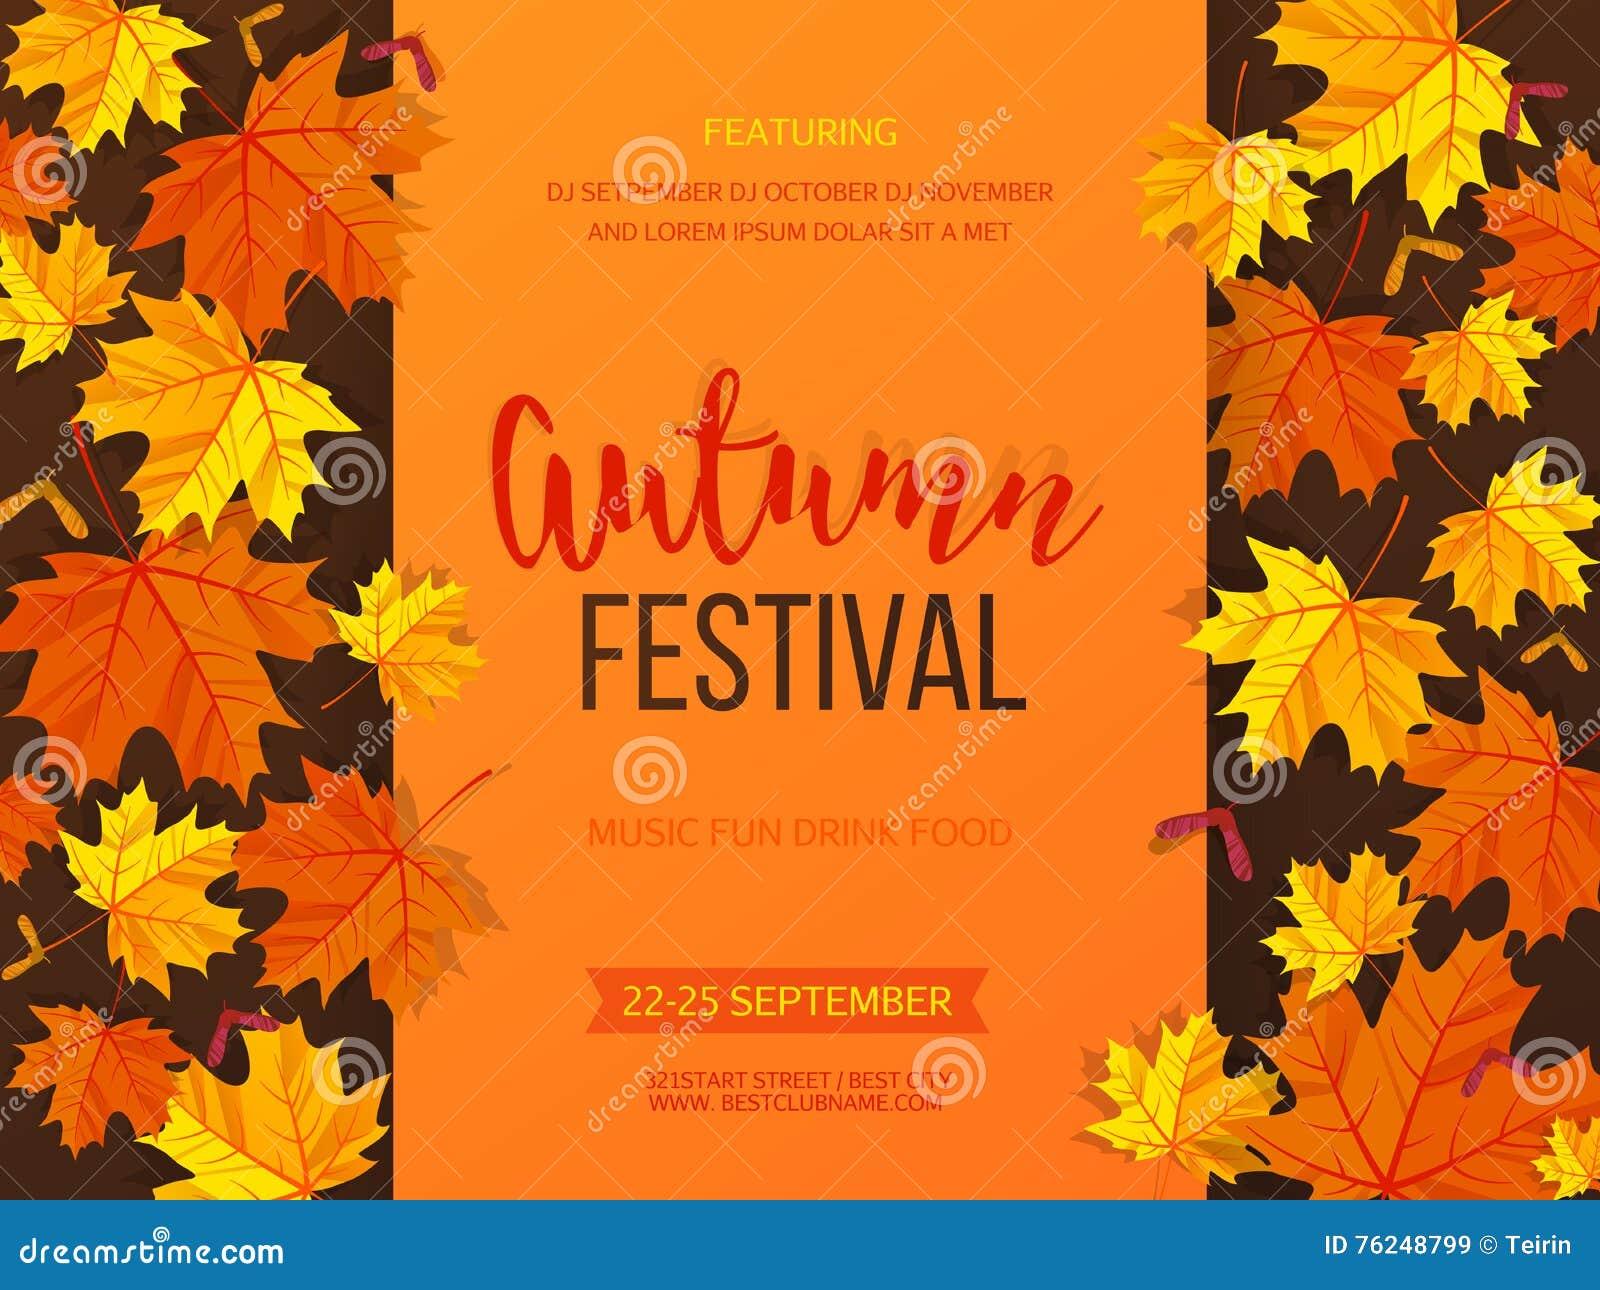 Autumn festival background invitation banner with fall leaves autumn festival background invitation banner with fall leaves vector illustration kristyandbryce Images